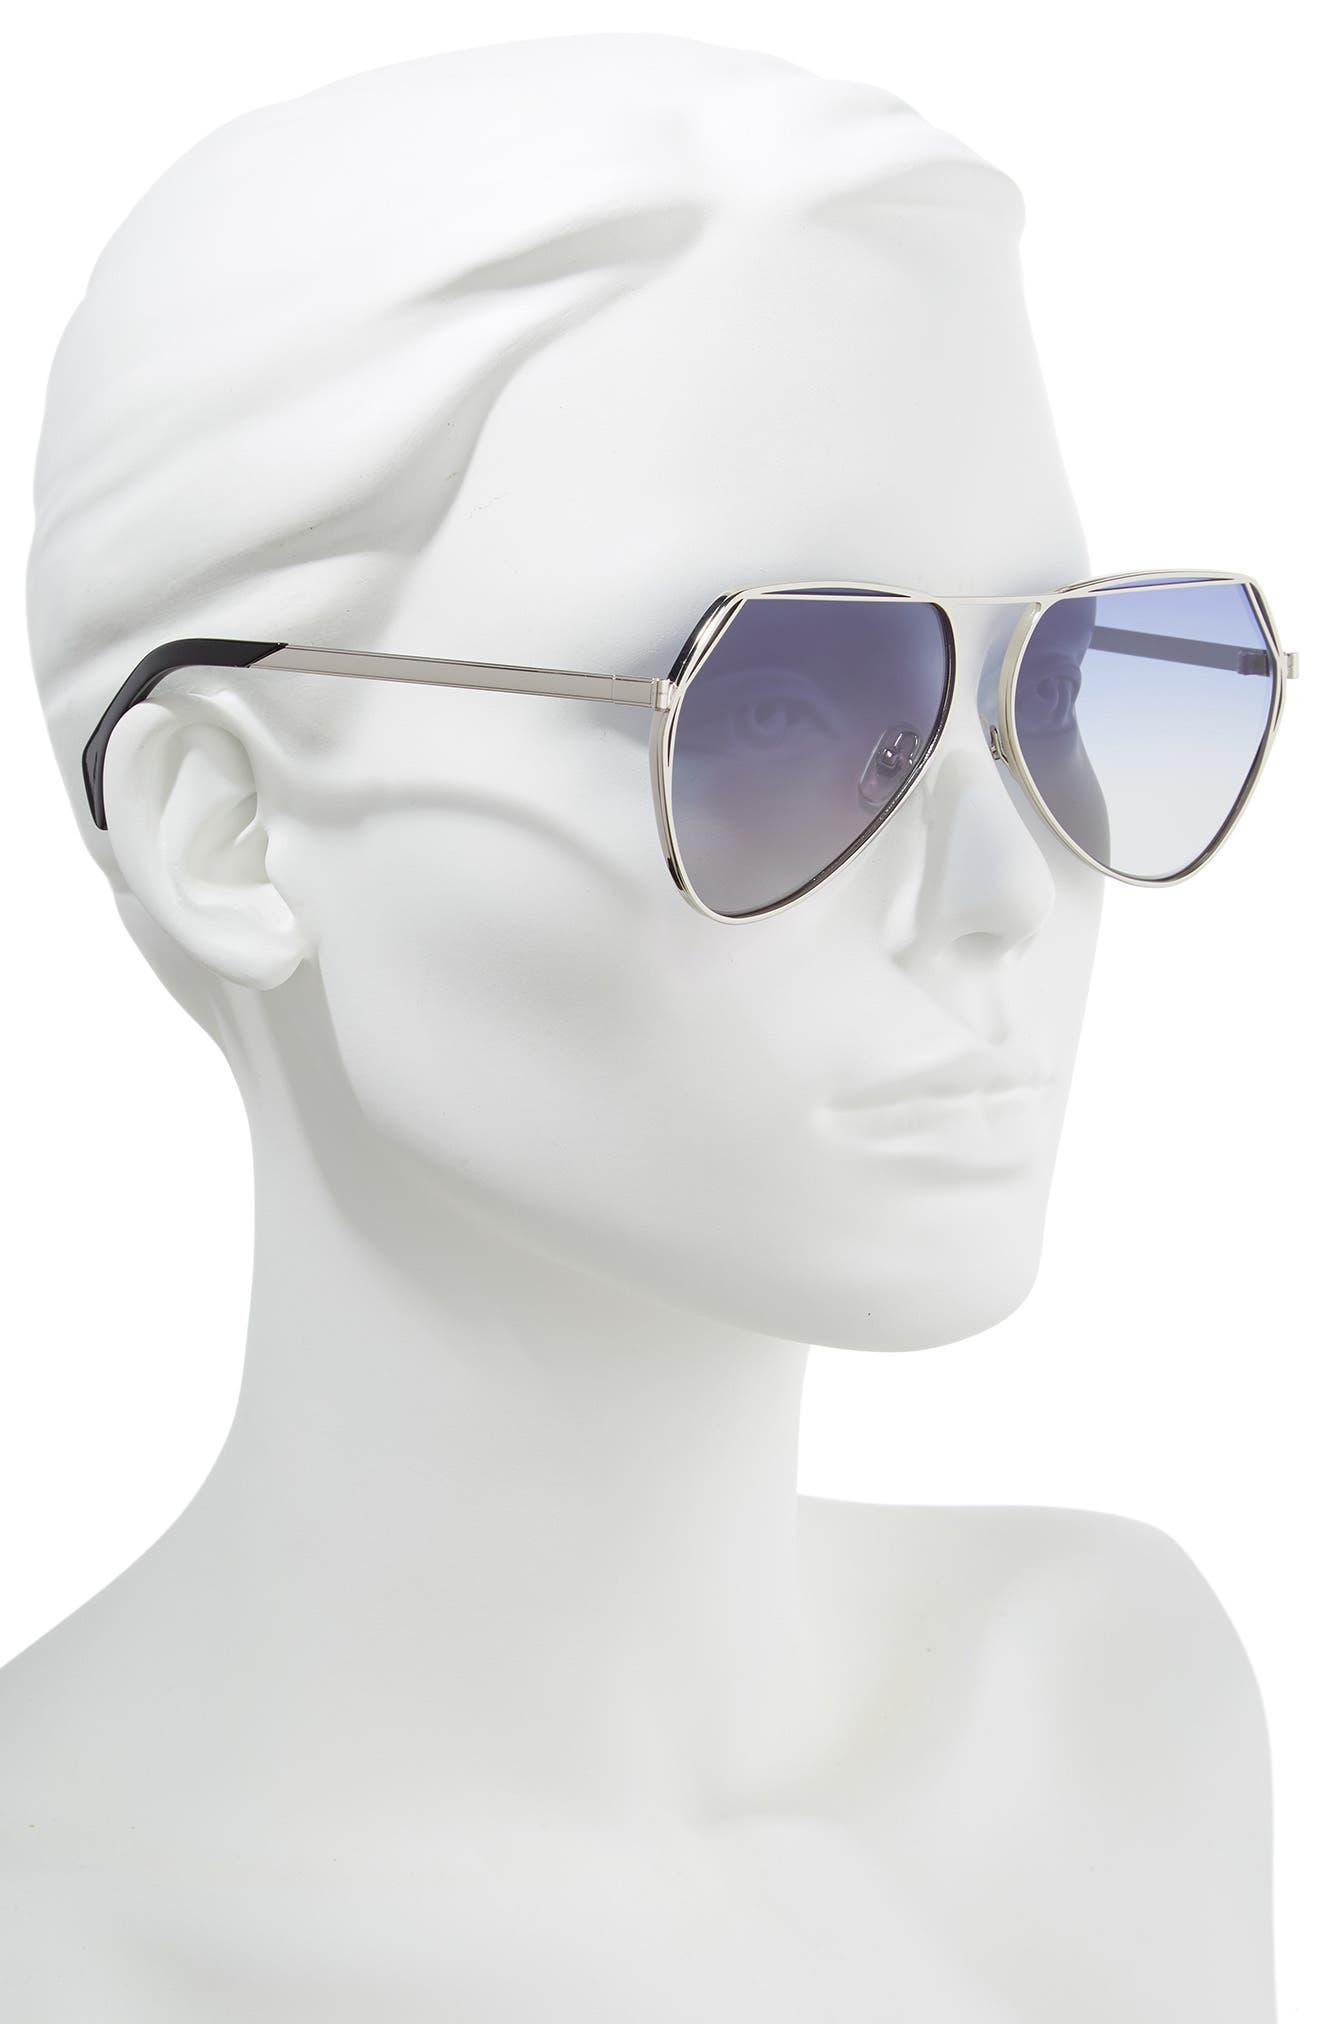 Taj 62mm Oversize Aviator Sunglasses,                             Alternate thumbnail 2, color,                             SILVER/ GREY-BLUE GRADIENT